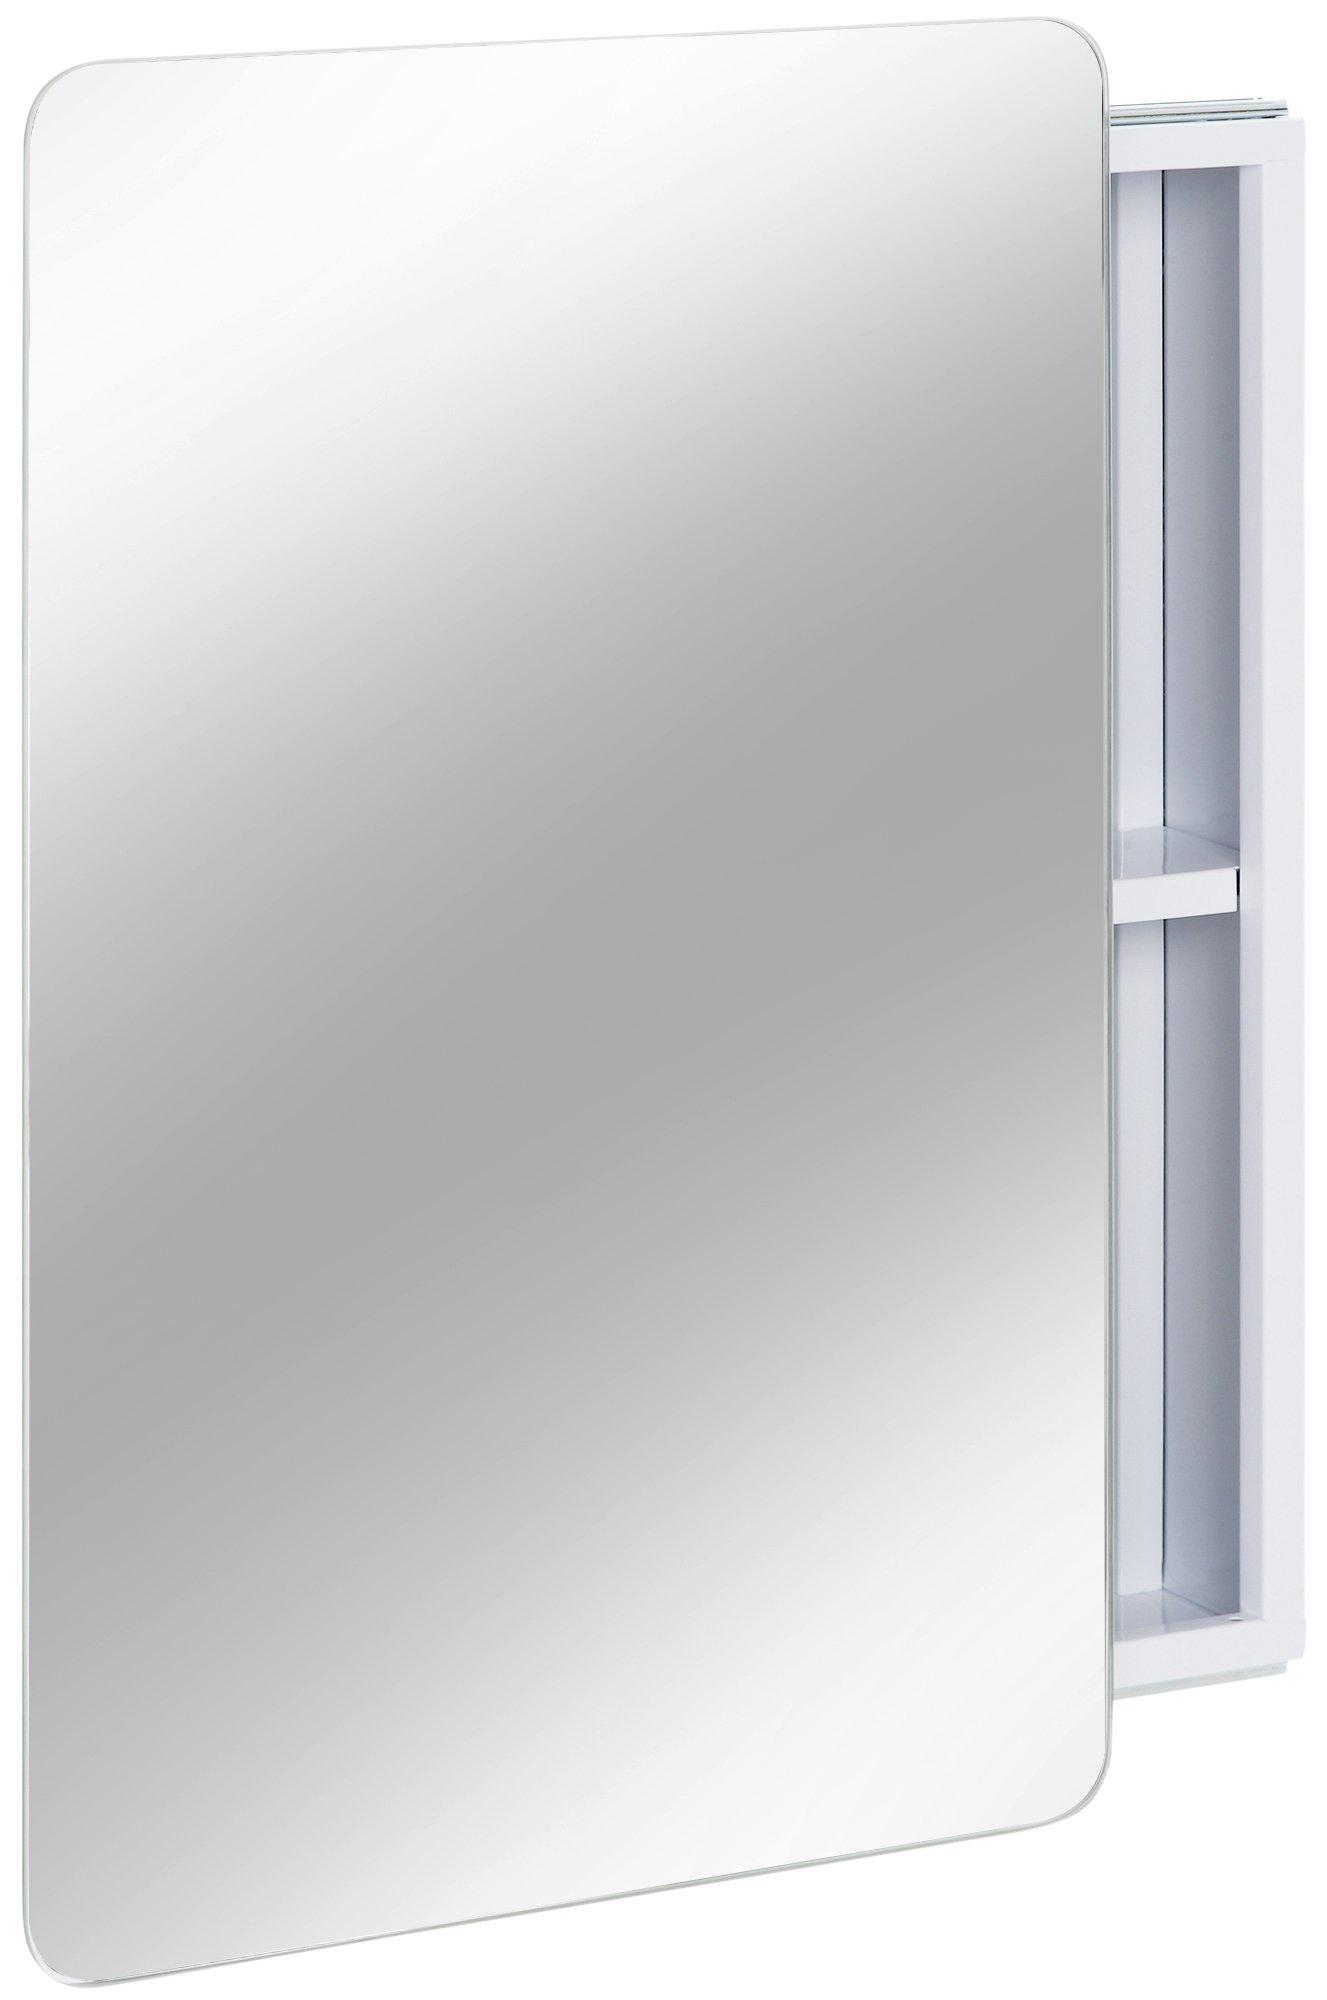 Argos Home Sliding Door Mirrored Bathroom Cabinet - White